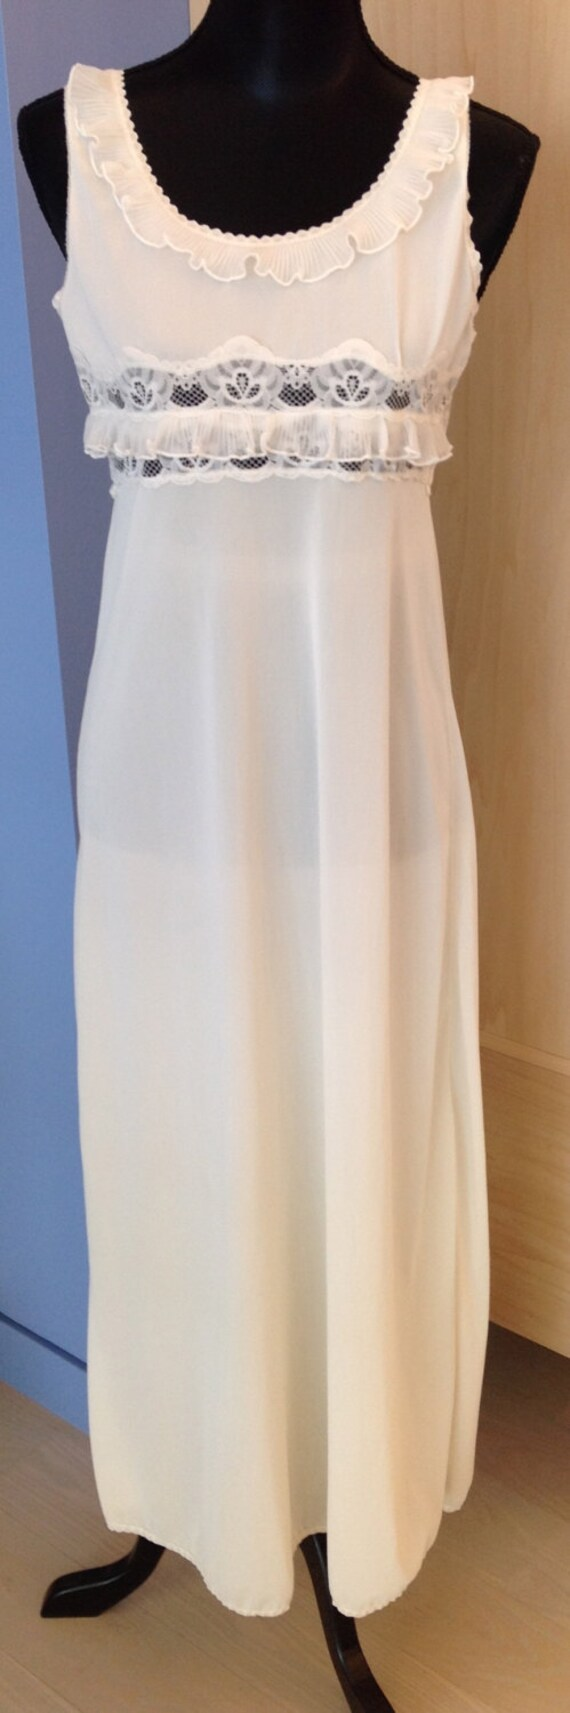 Ruffle Ivory Nightgown